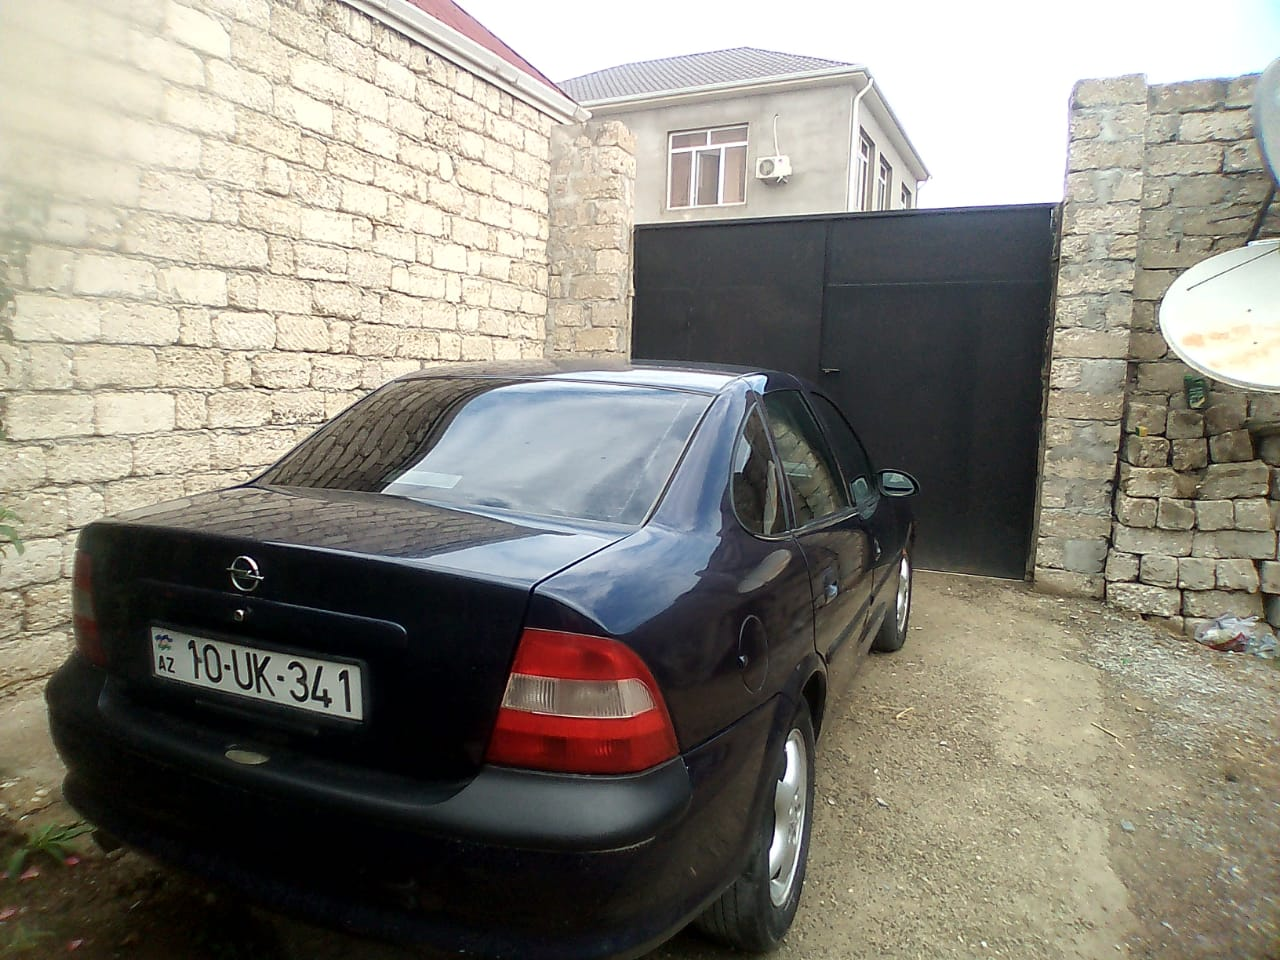 Opel Vectra 2.0(lt) 1998 İkinci əl  $3700